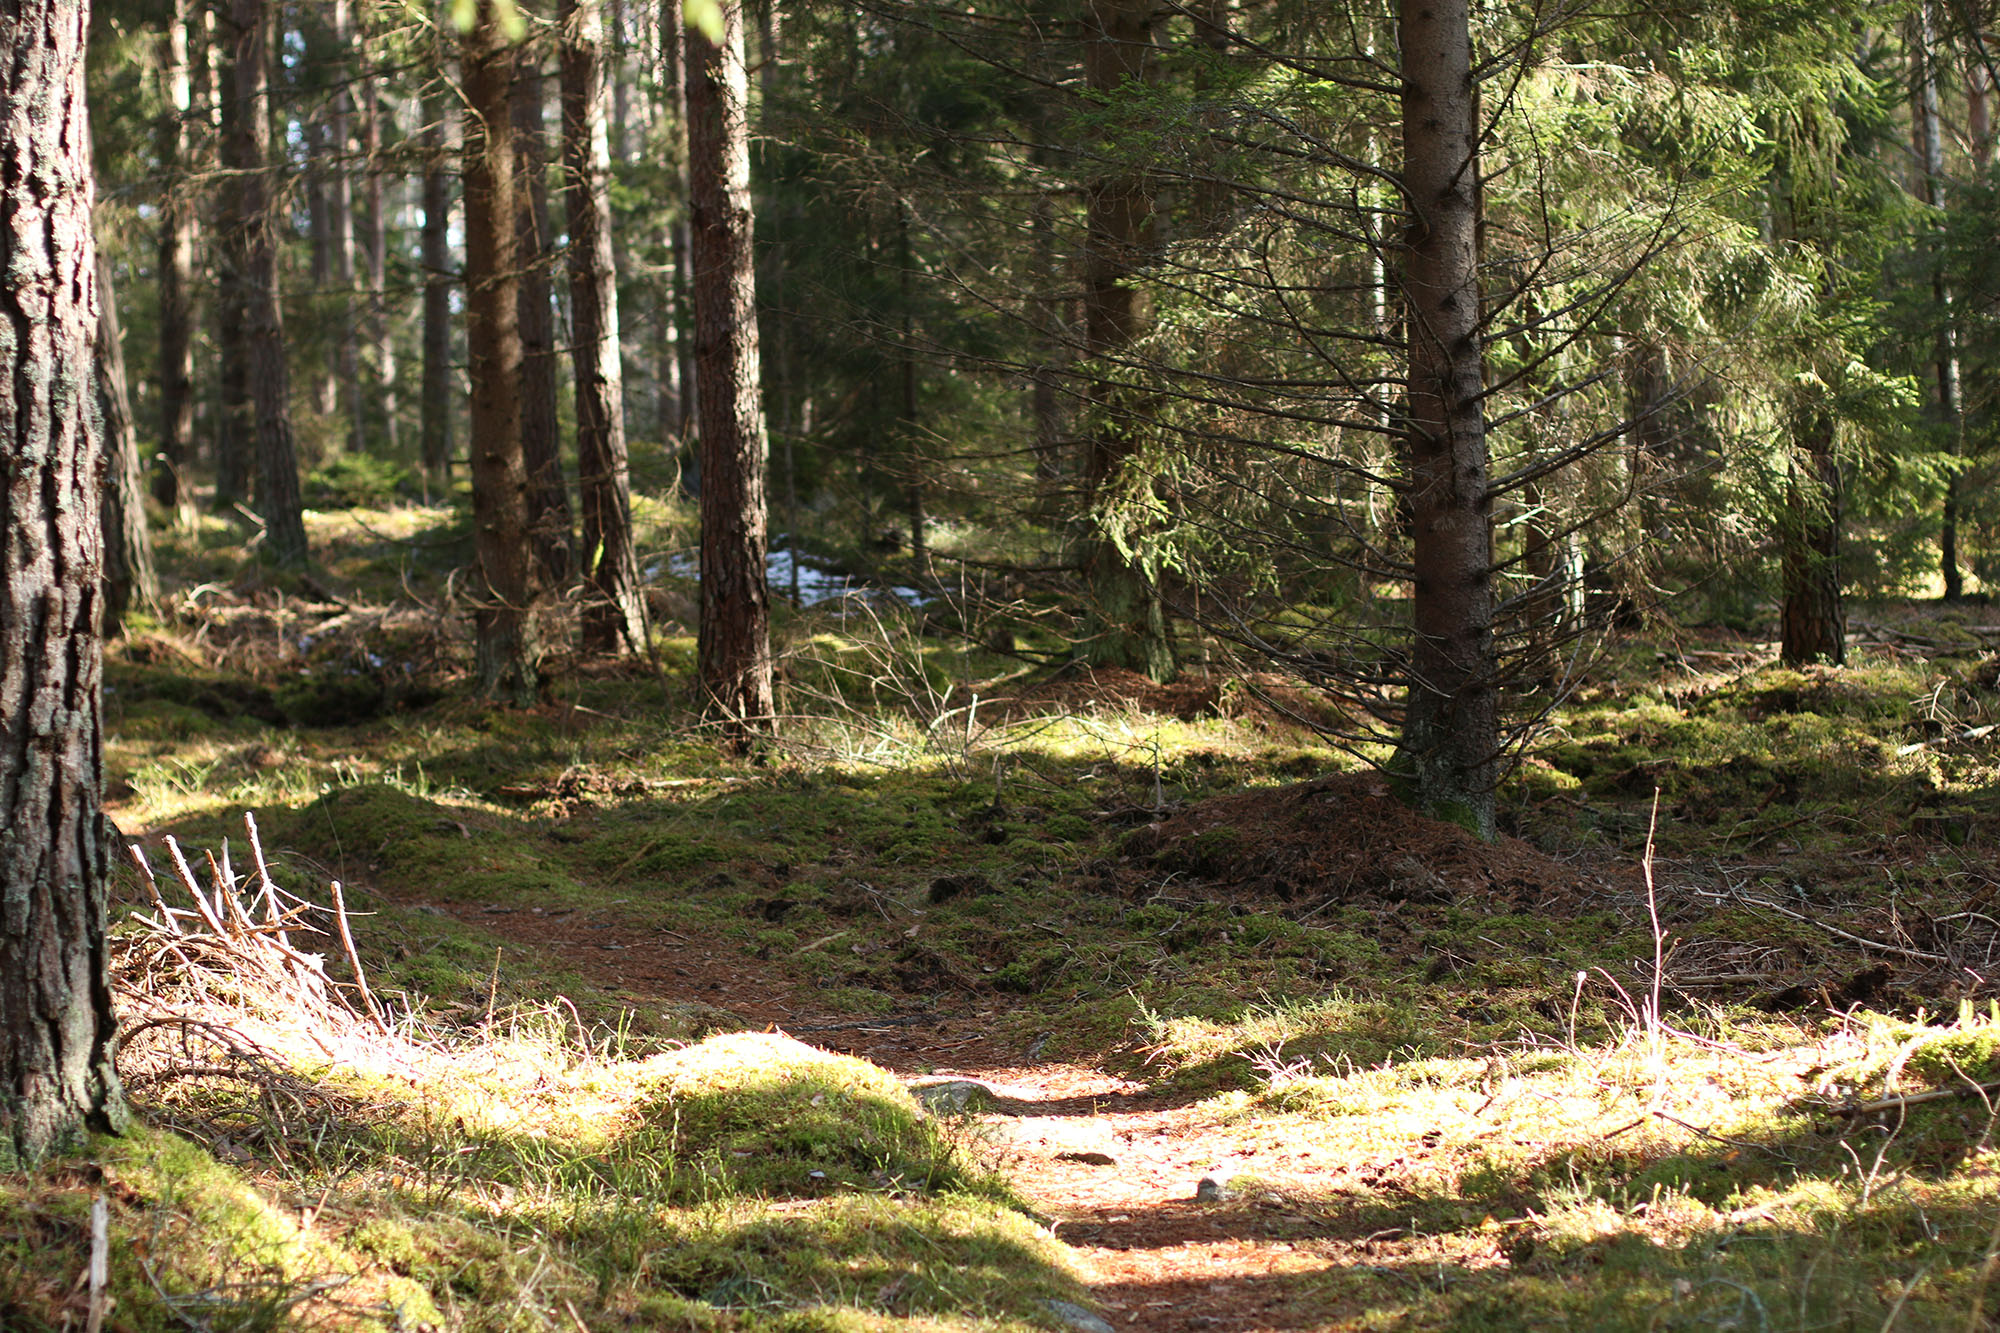 IMG_1238 skogen picknick x